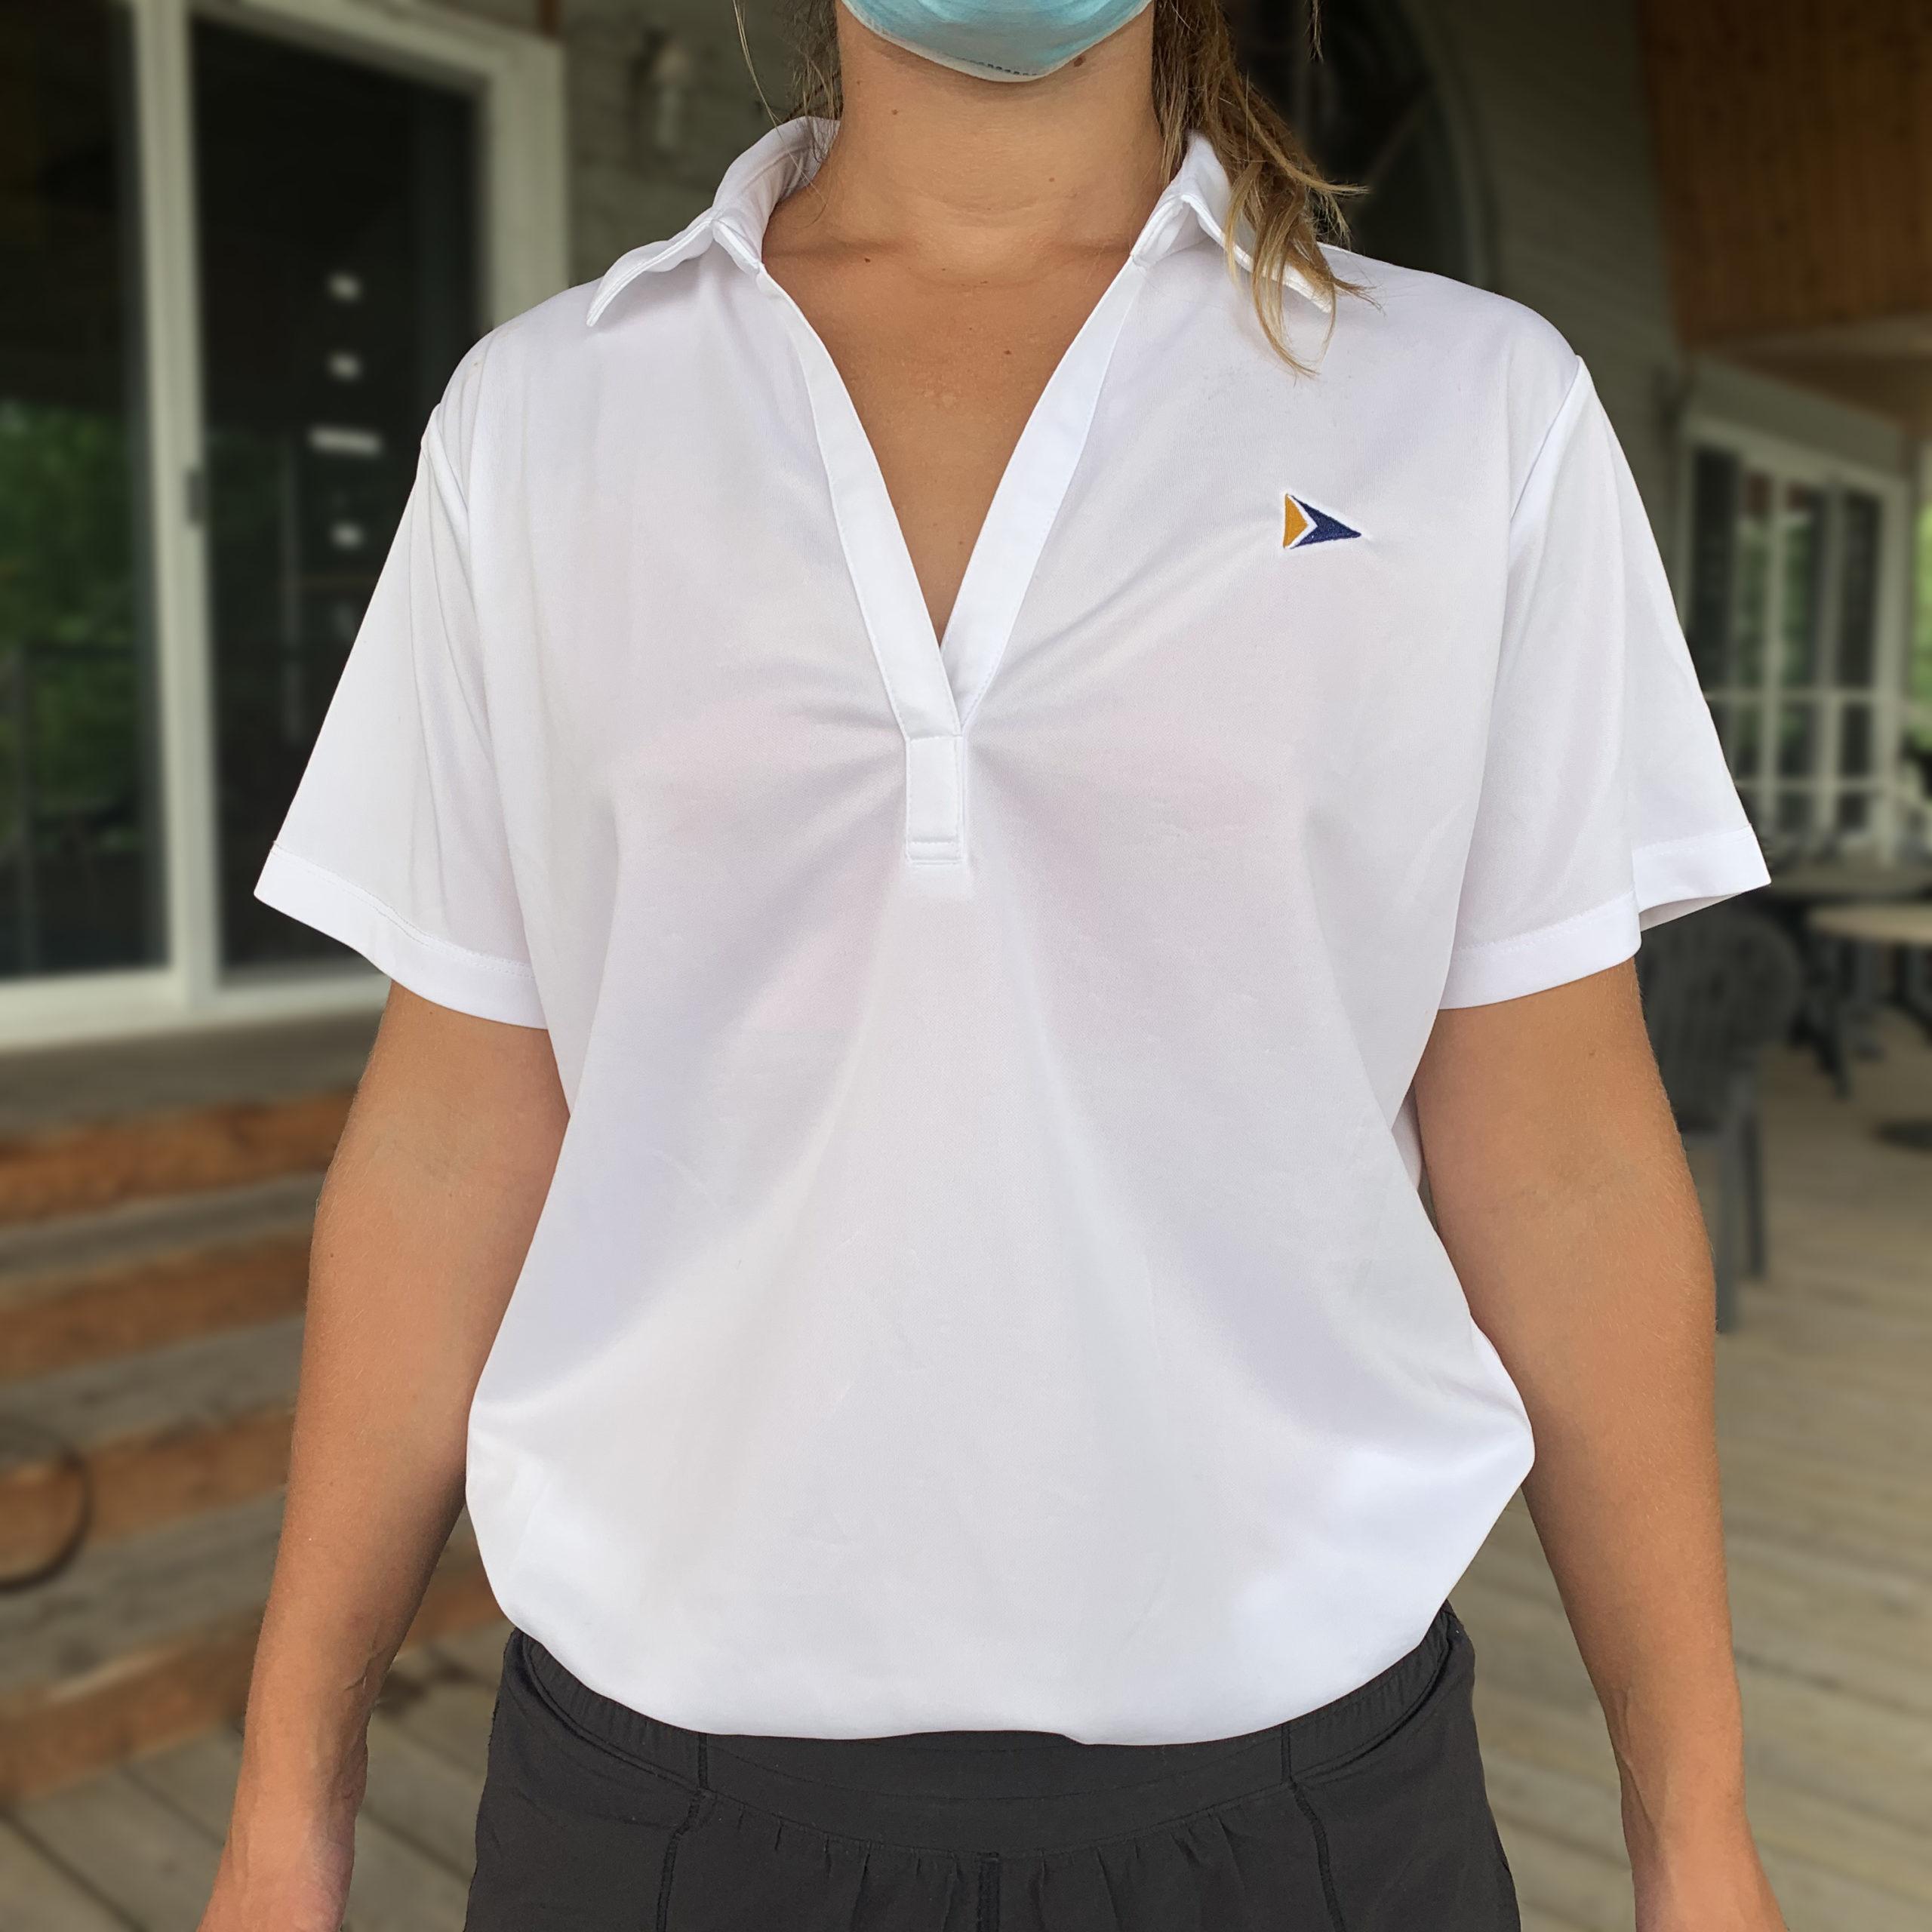 Ladies' Golf Shirt - $25